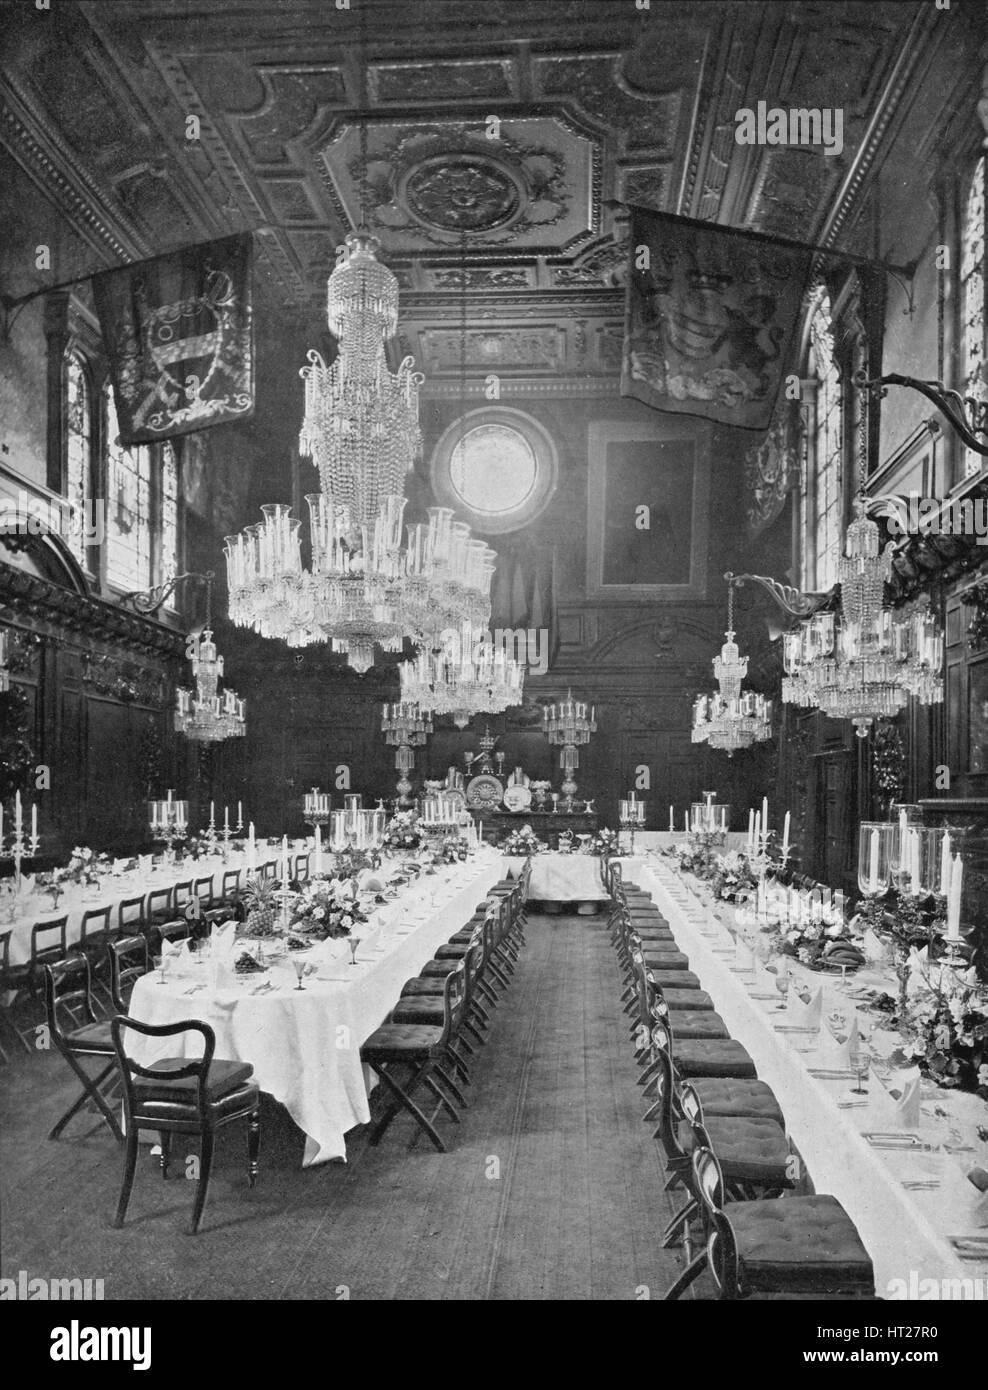 Interior of Mercers' Hall, City of London, c1910 (1911). Artist: Sandell Ltd. - Stock Image